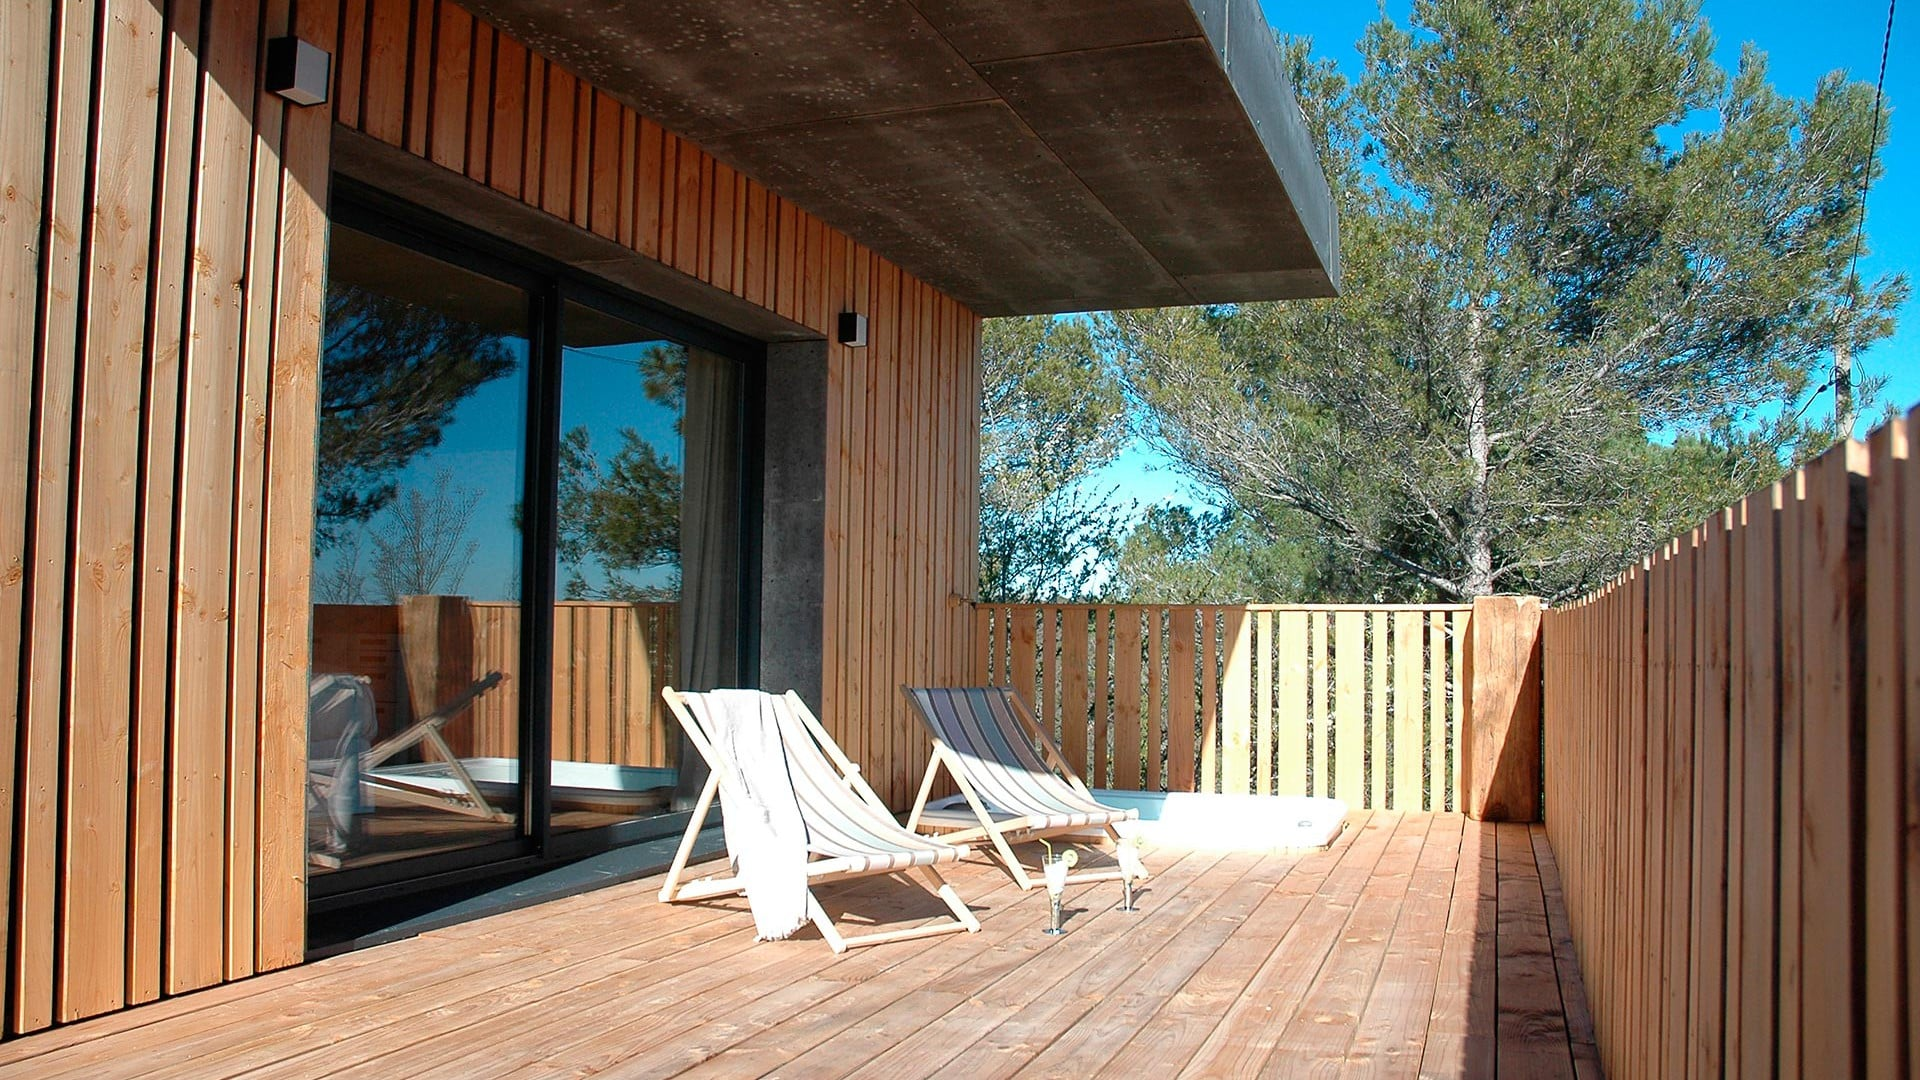 3 chambres d 39 hotes avec sauna et jacuzzi nimes dans le gard. Black Bedroom Furniture Sets. Home Design Ideas